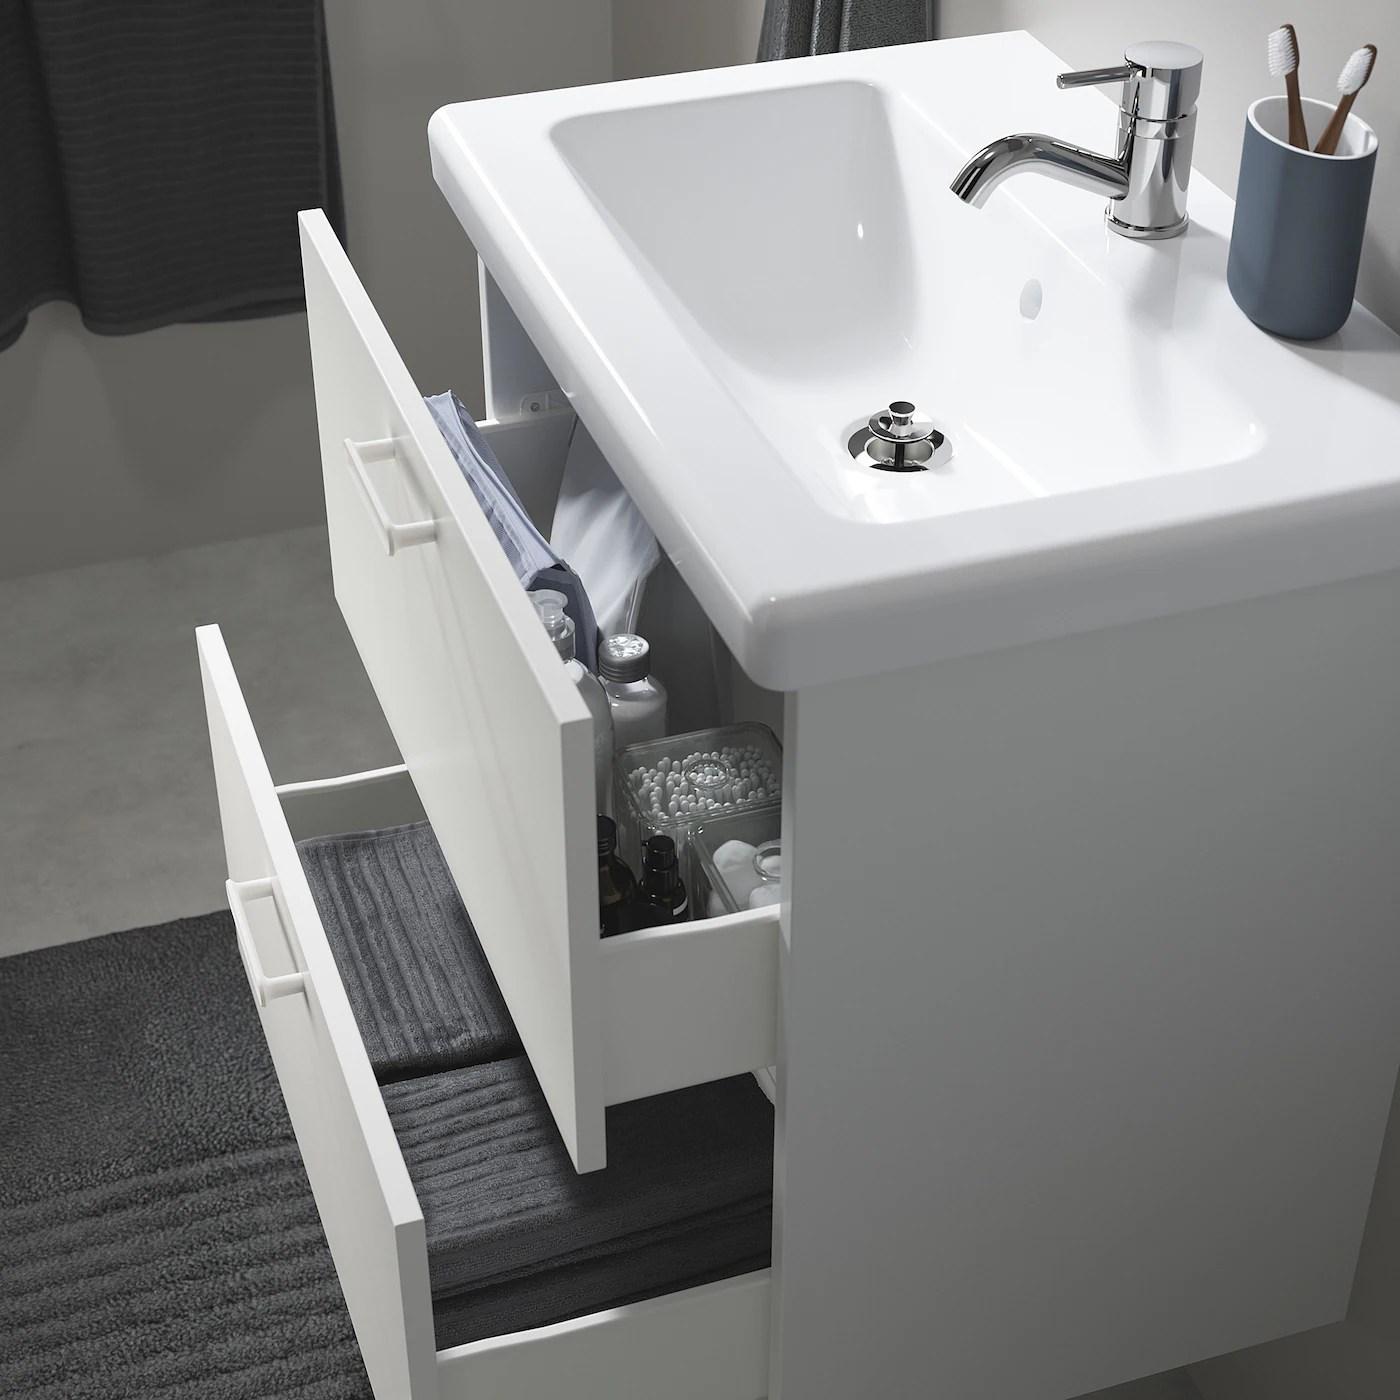 Enhet Tvallen Meuble Lavabo 2tir Blanc Pilkan Mitigeur Lavabo 64x43x87 Ikea